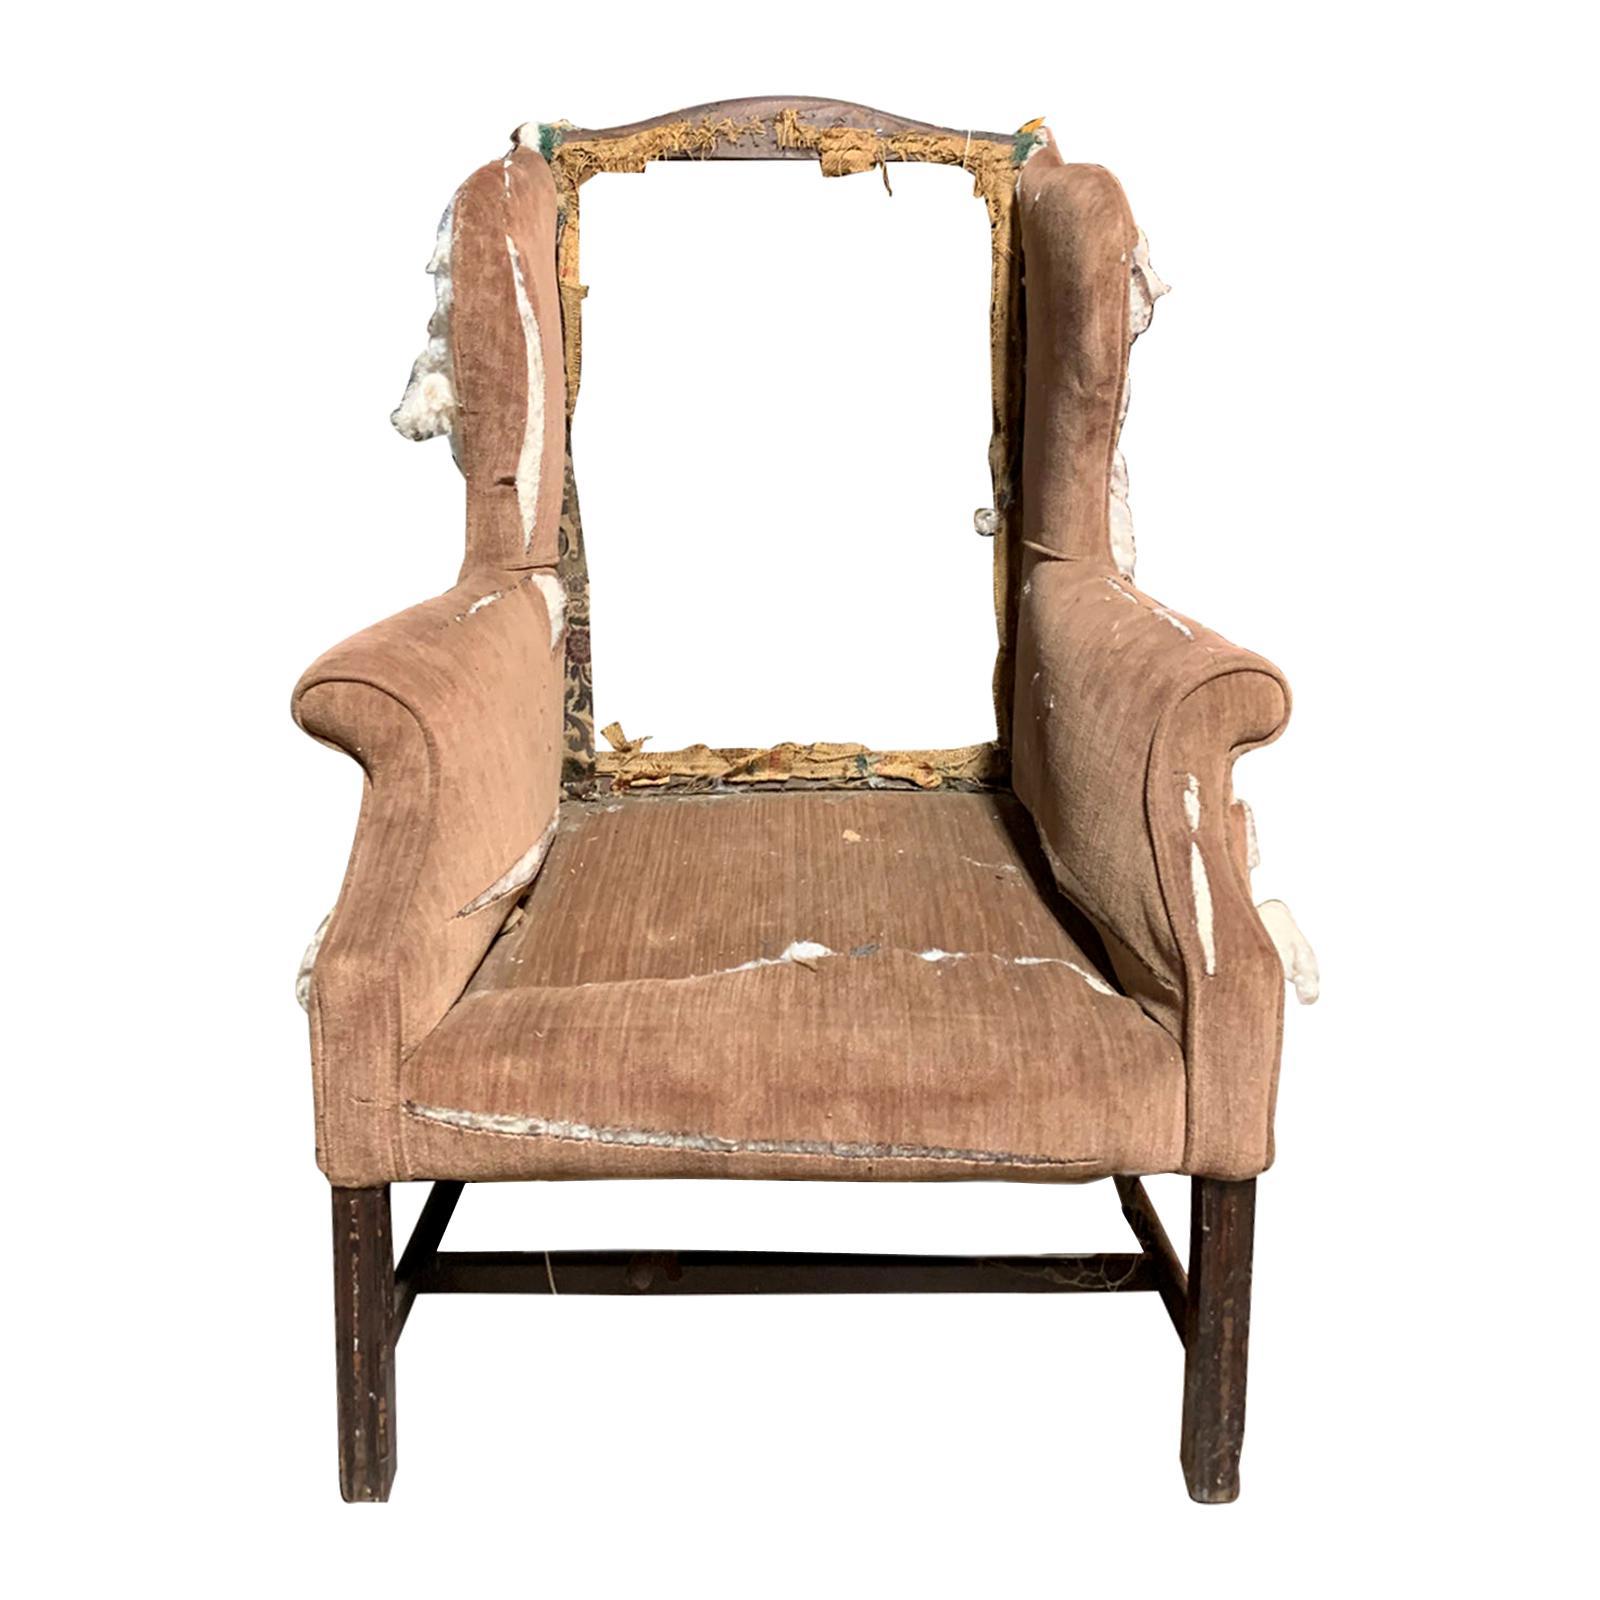 19th Century English Wingback Chair